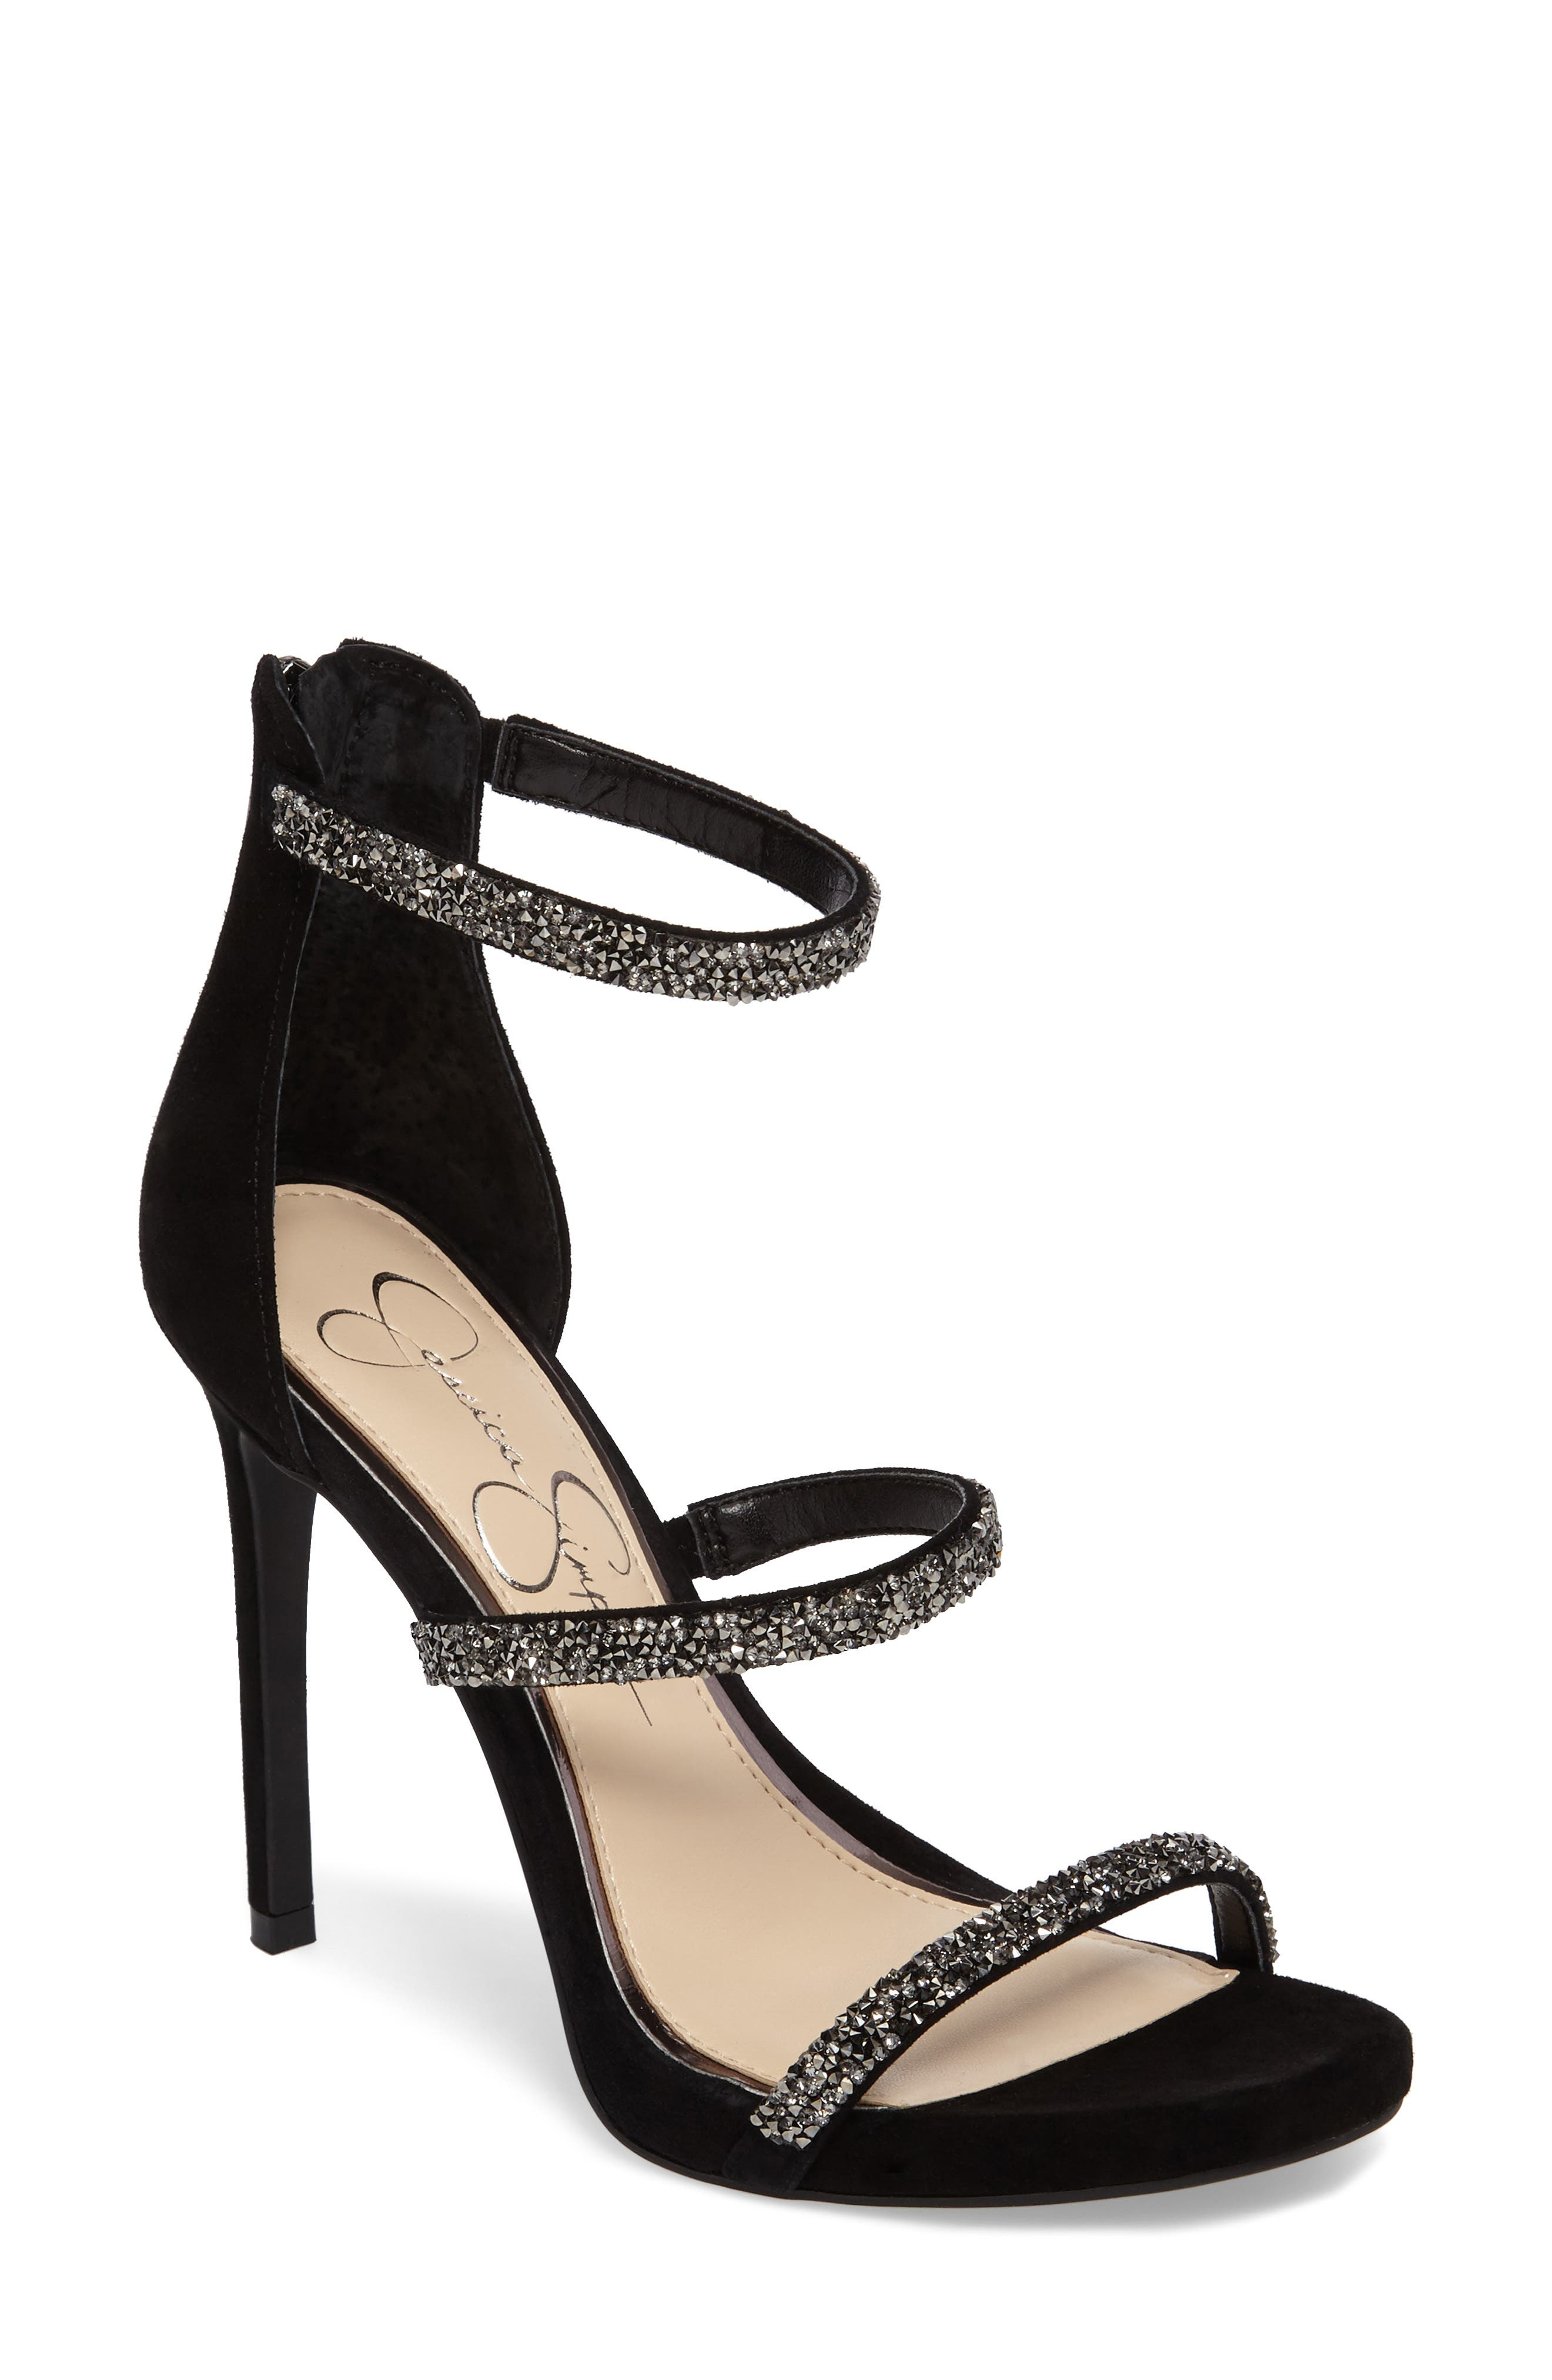 Rennia Sandal,                         Main,                         color, Black/ Jetsto